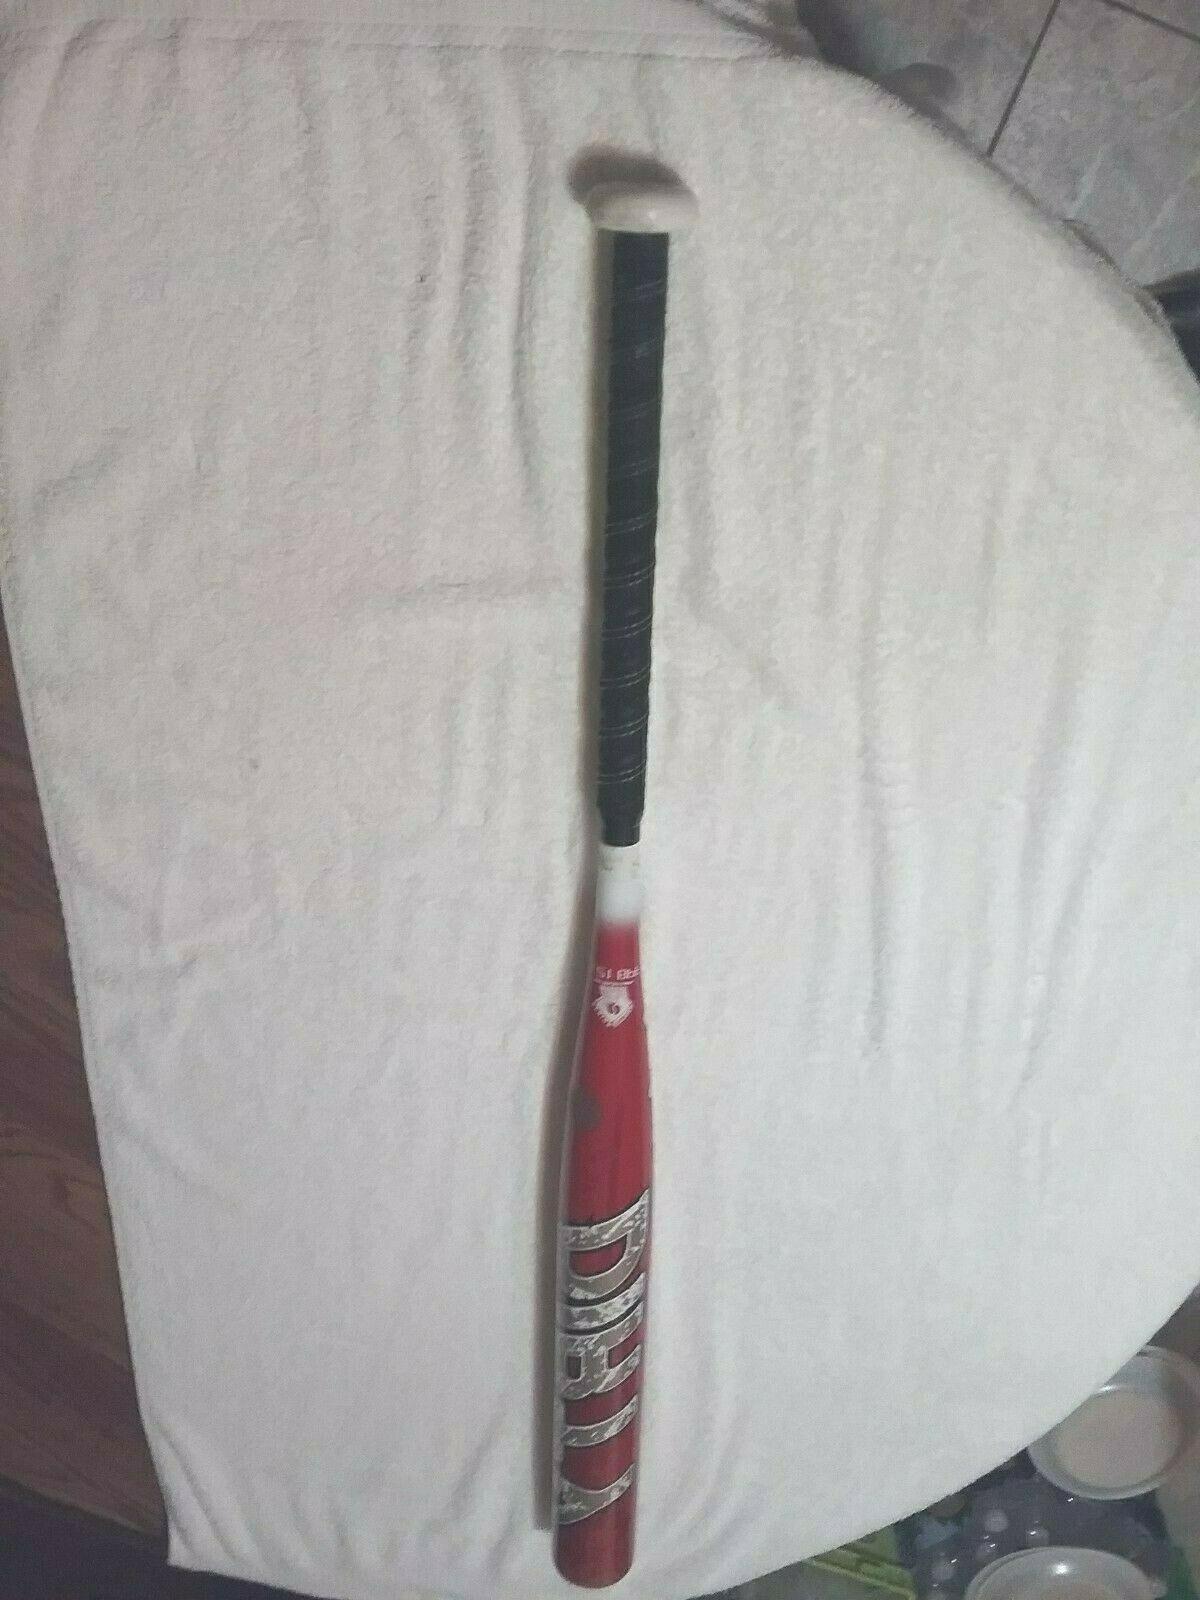 dirty senior softball bat balanced 34 27